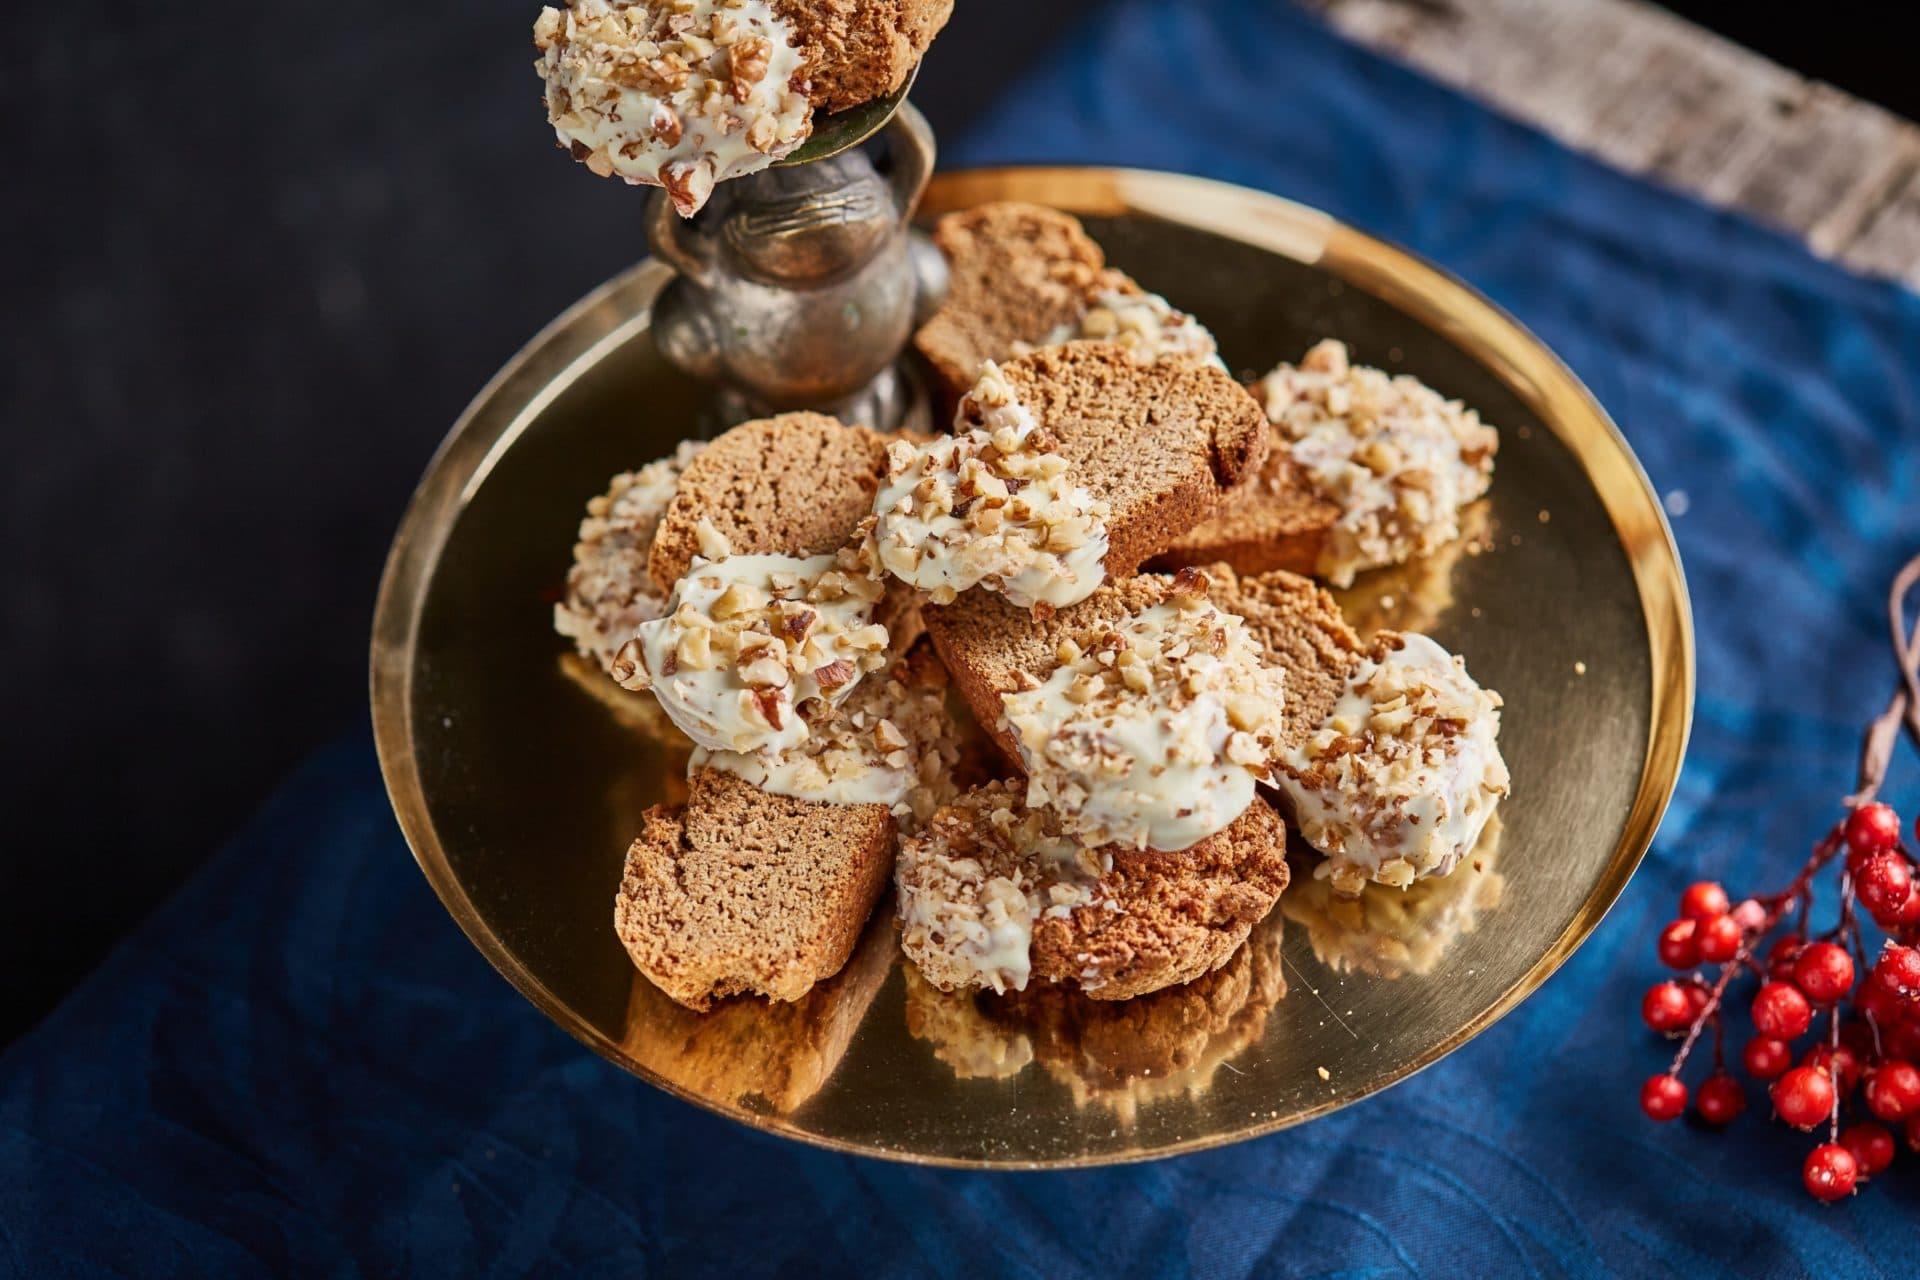 mézeskalácsos biscotti